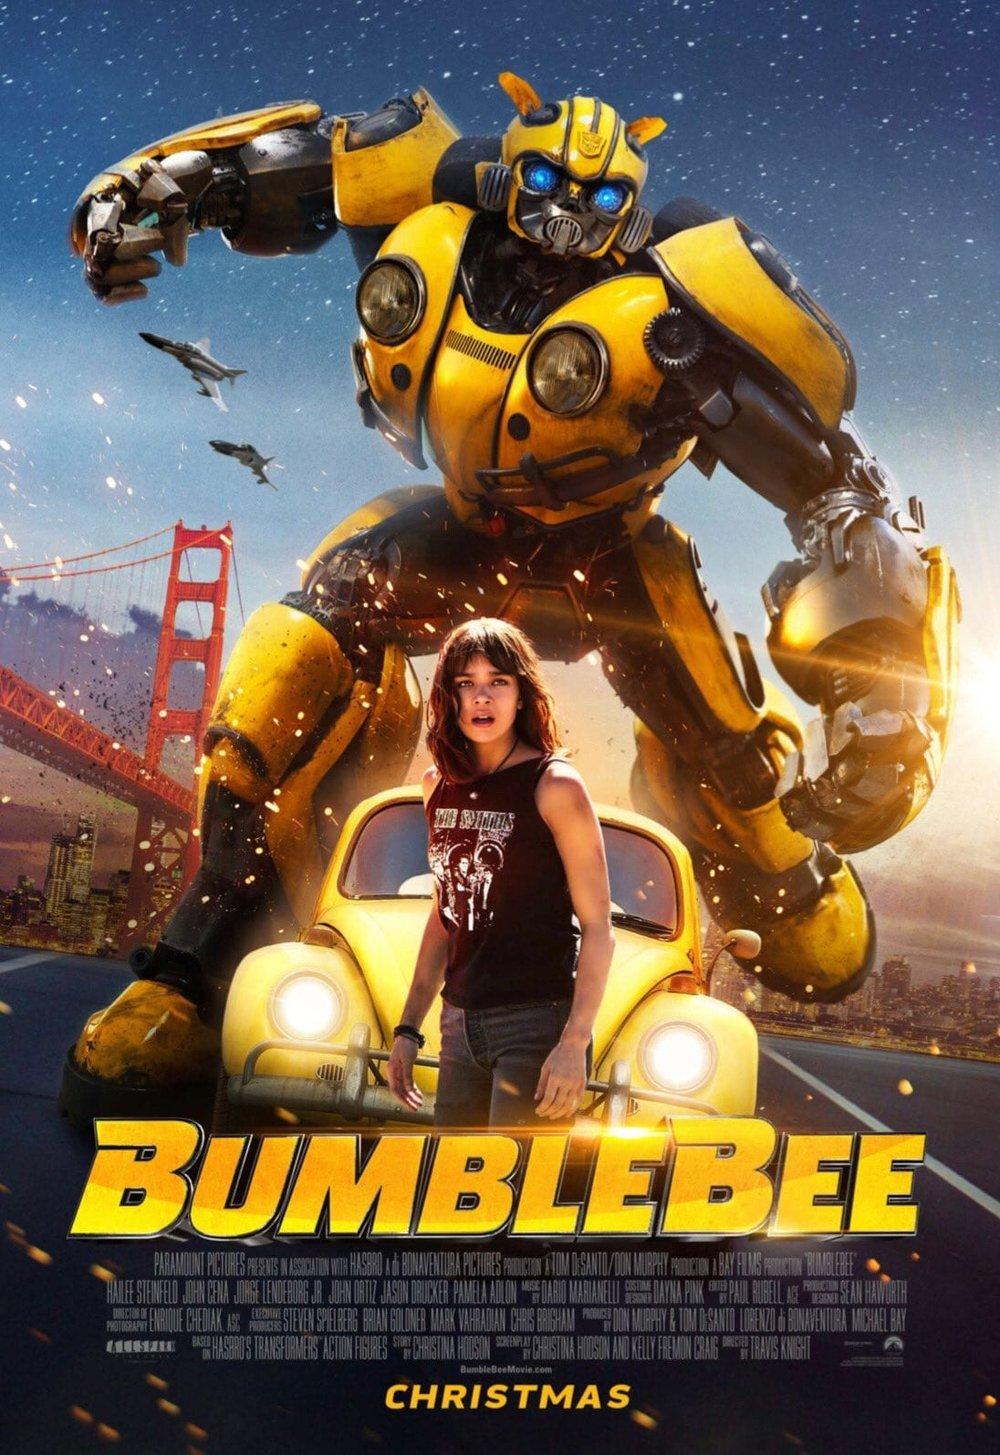 Bumblebee-poster-35462.jpg